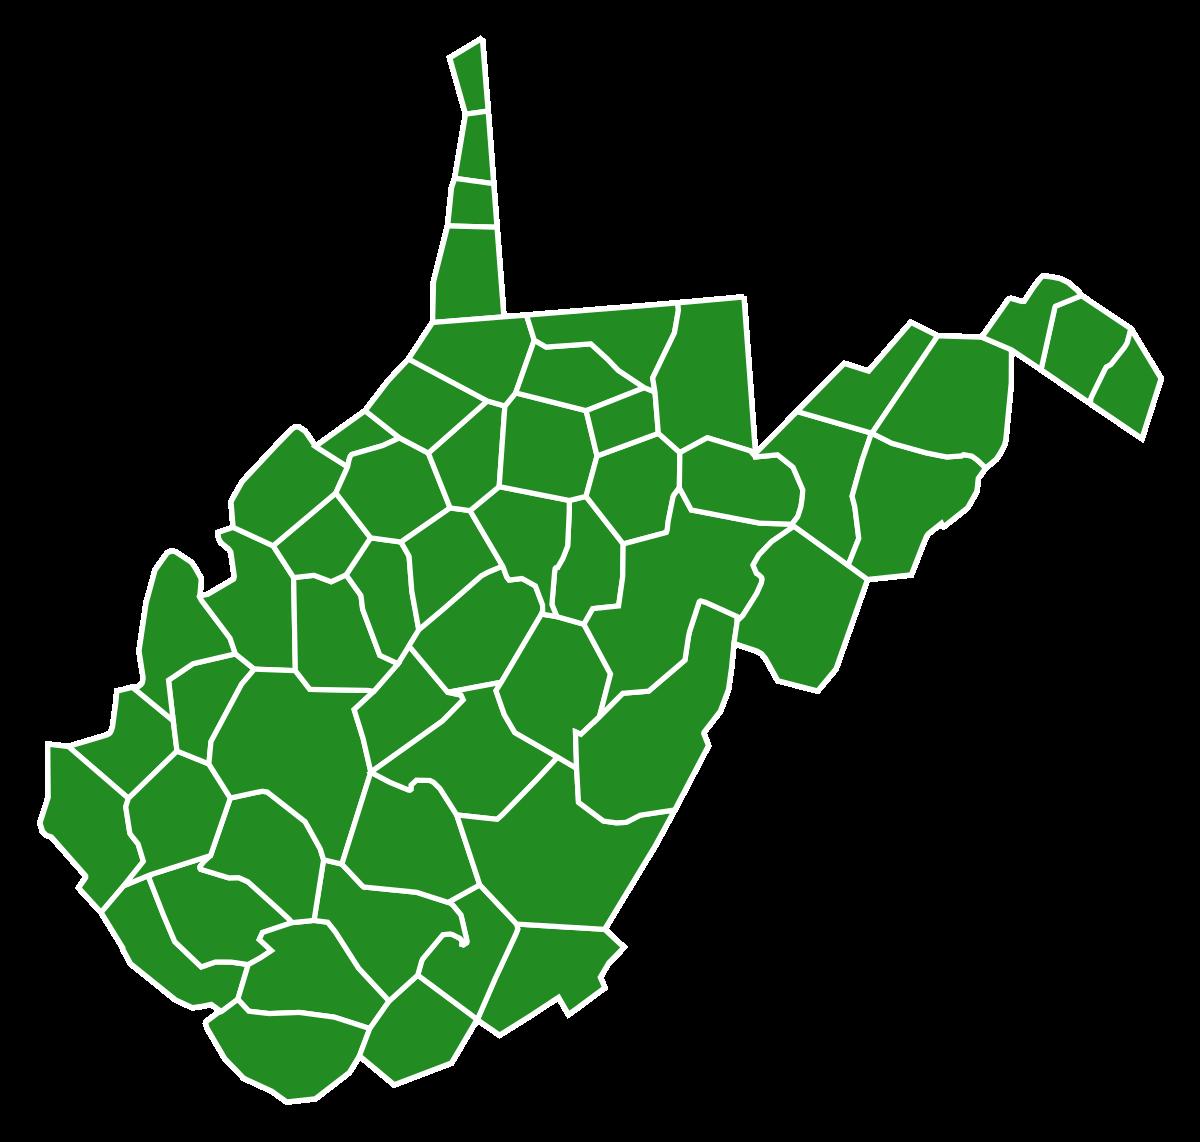 Democracy clipart primary caucus. West virginia democratic wikipedia